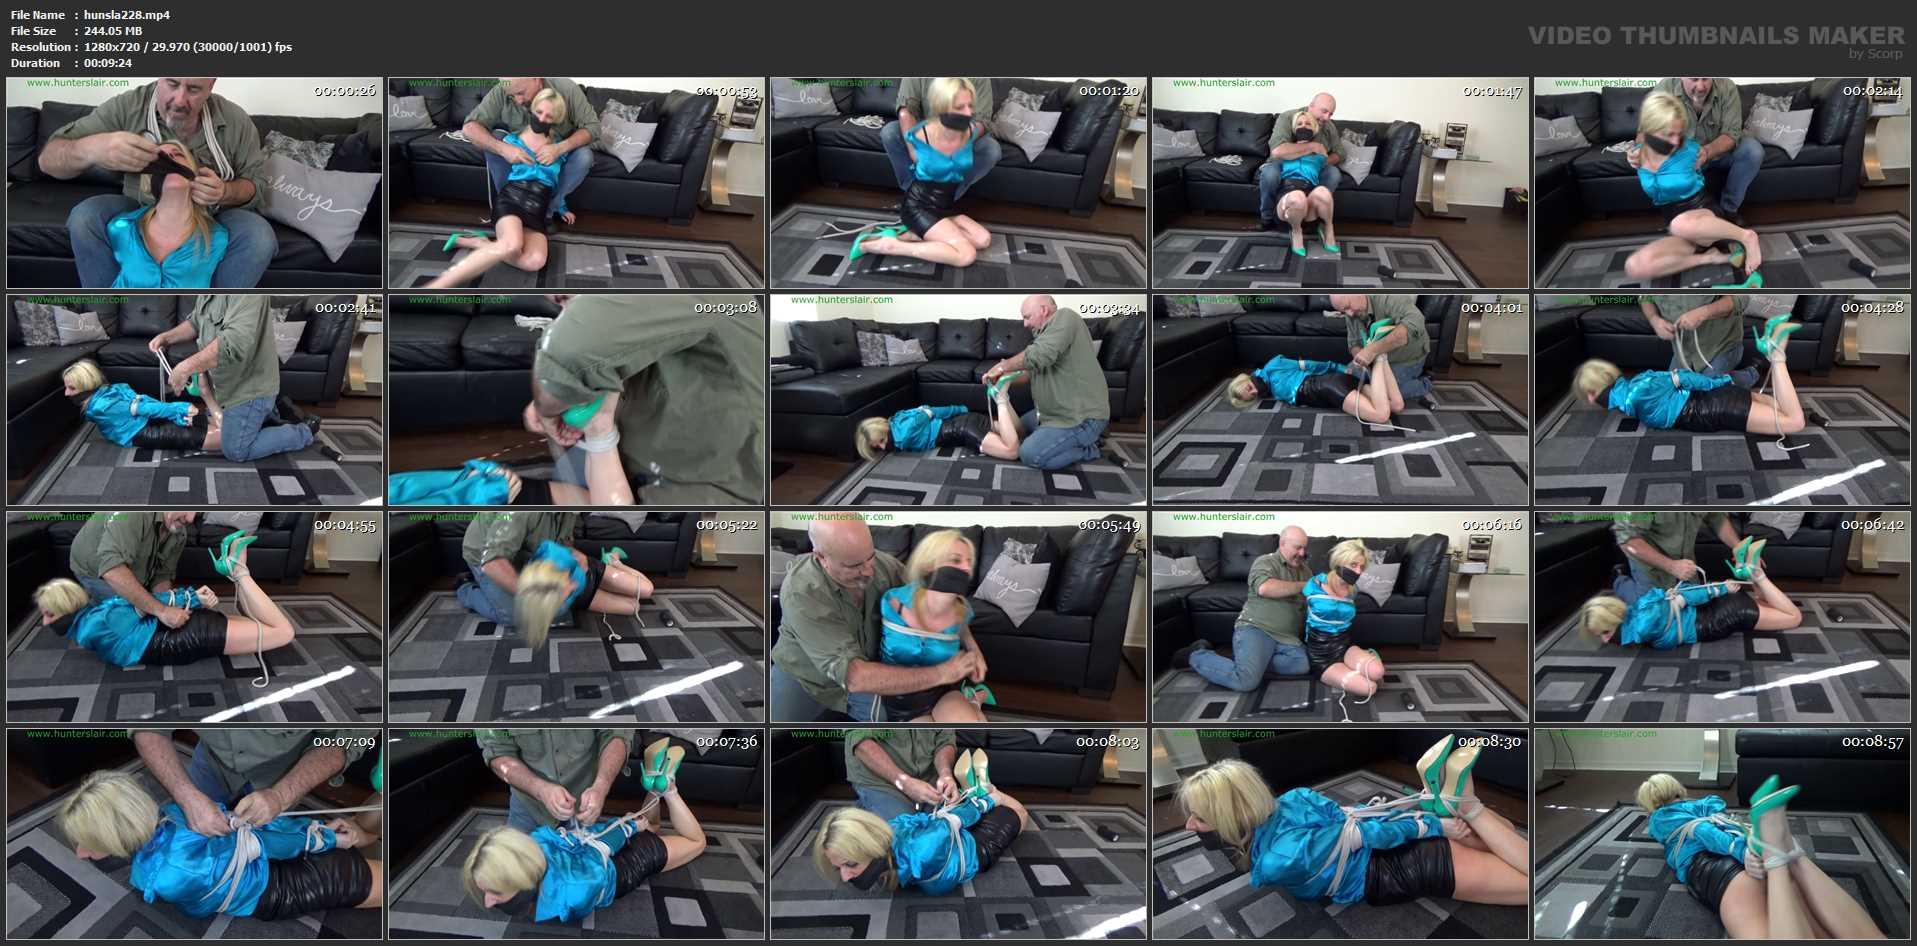 [HUNTERSLAIR] Haughty blond brat hogtied and helpless. Featuring: Roxie Rae [HD][720p][MP4]